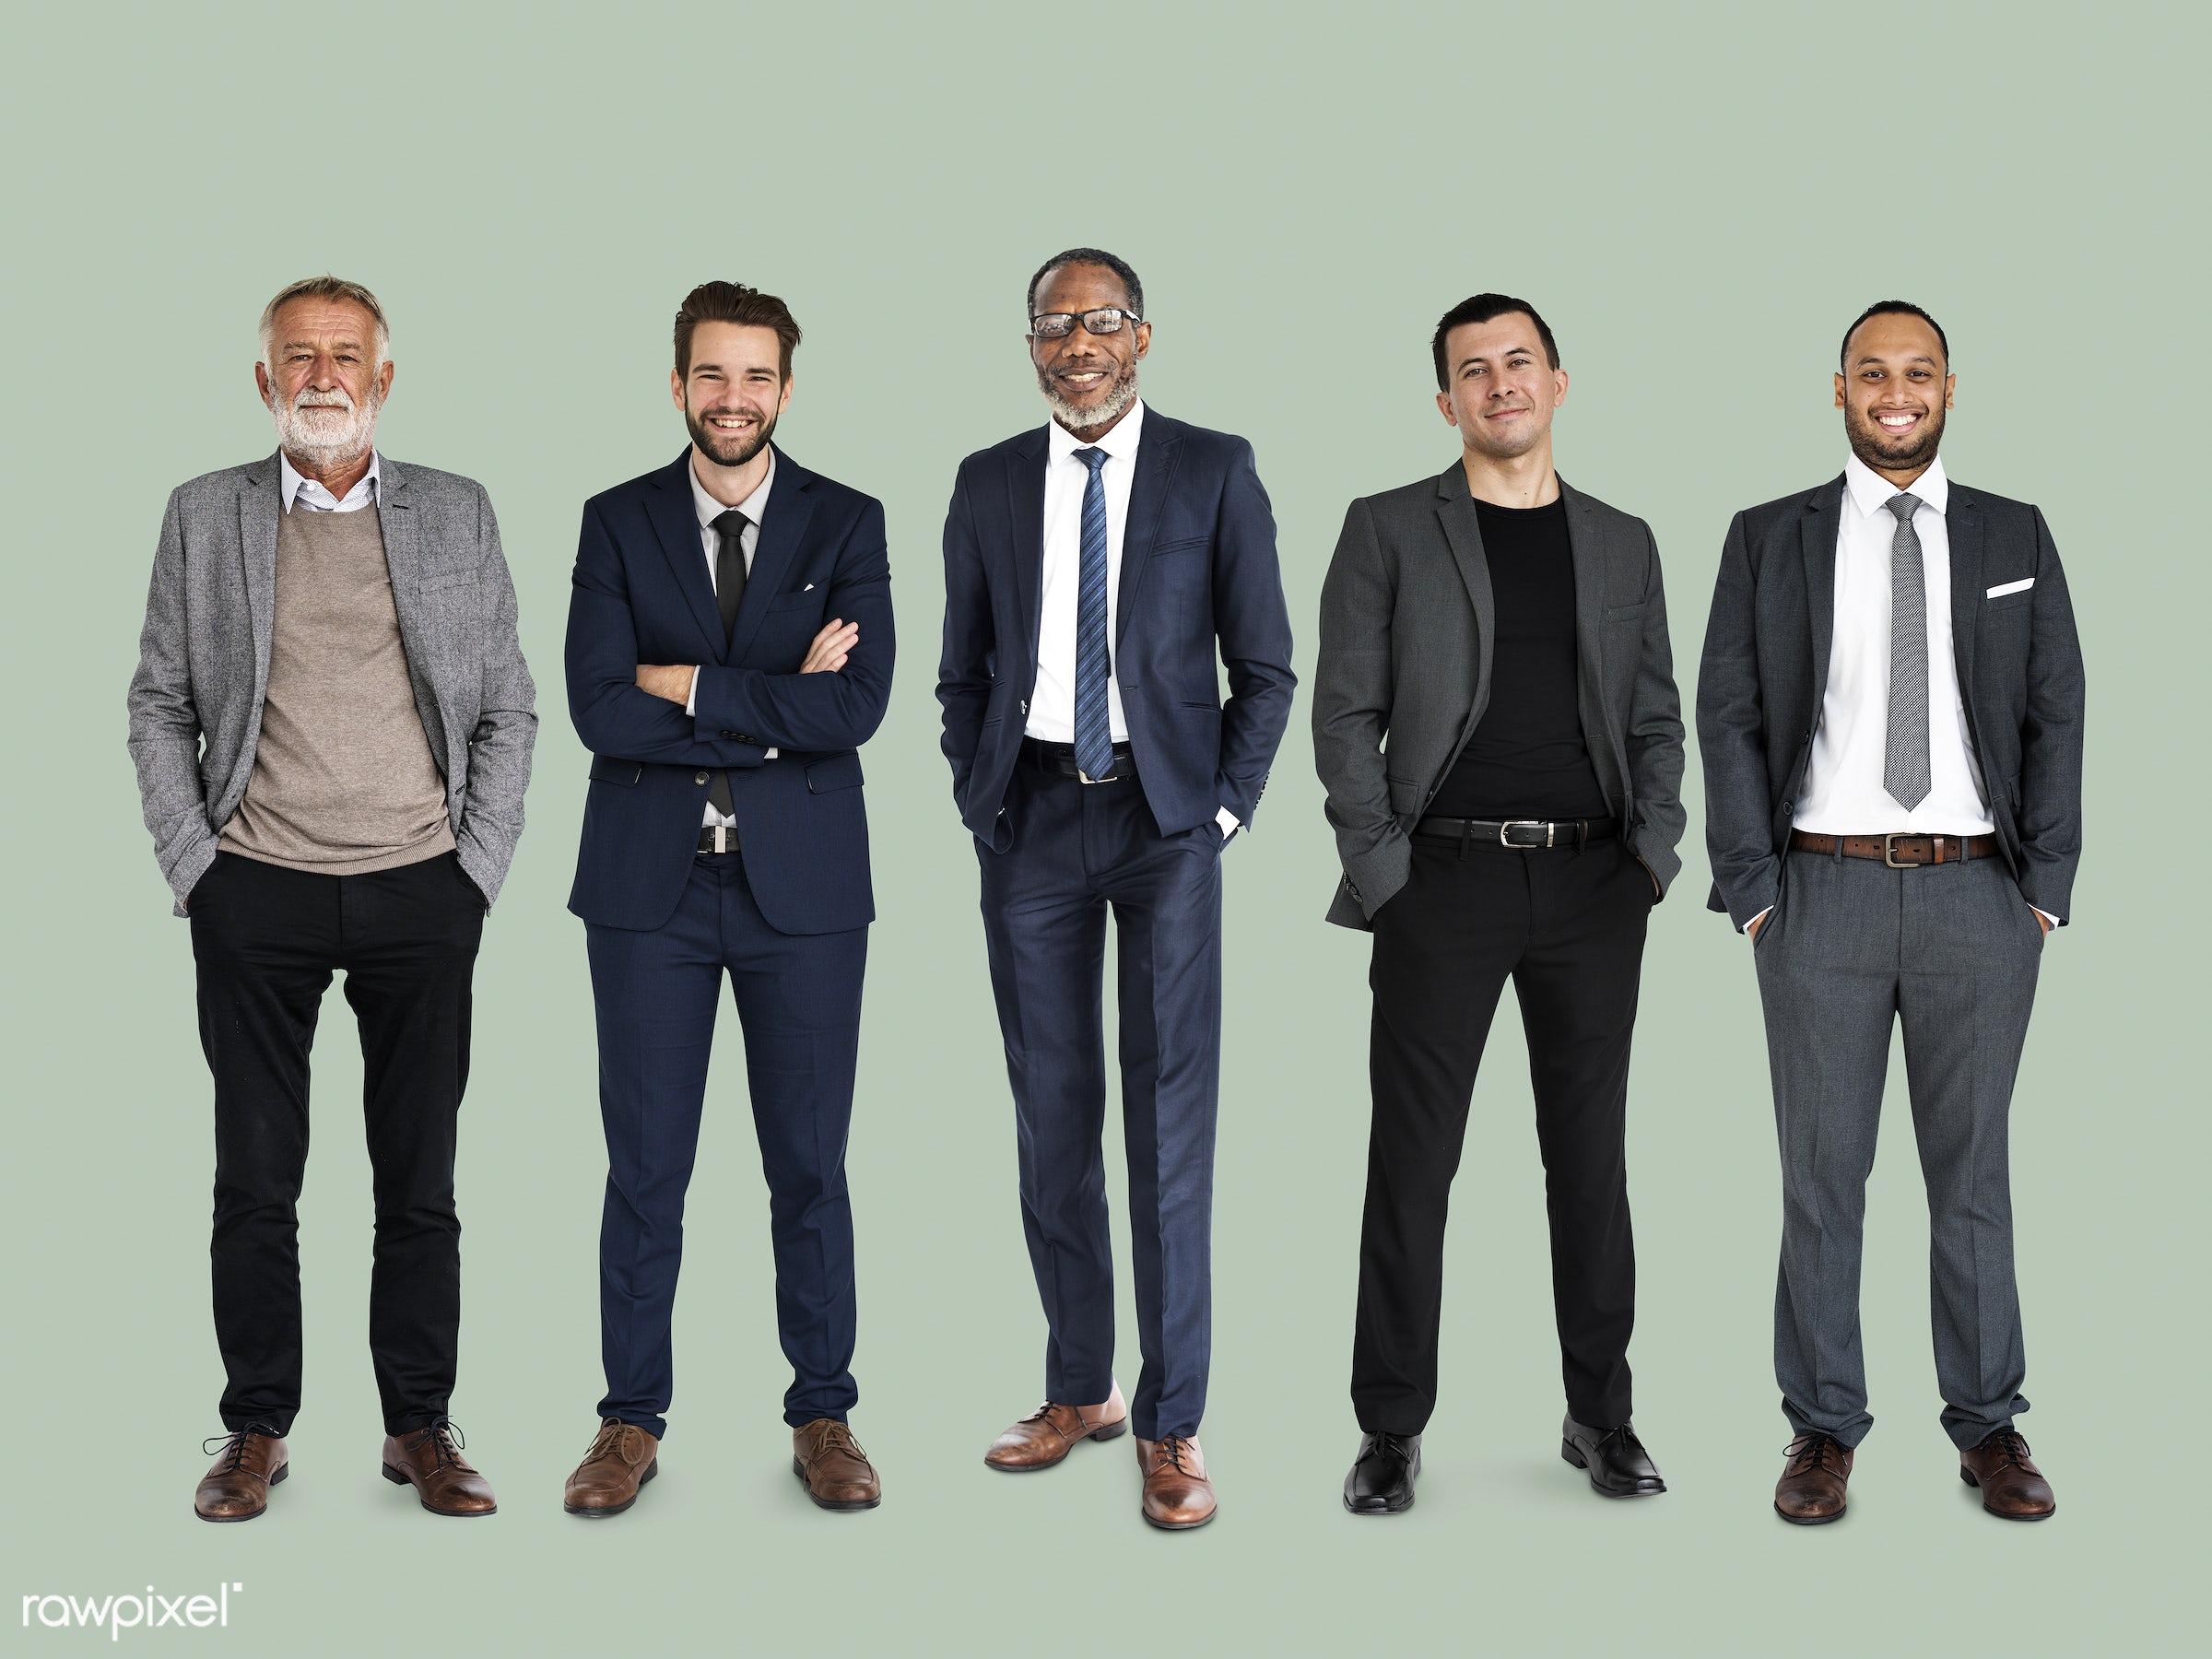 studio, manager, full length, diverse, profession, people, caucasian, teamwork, assistant, lifestyle, studio squareset,...